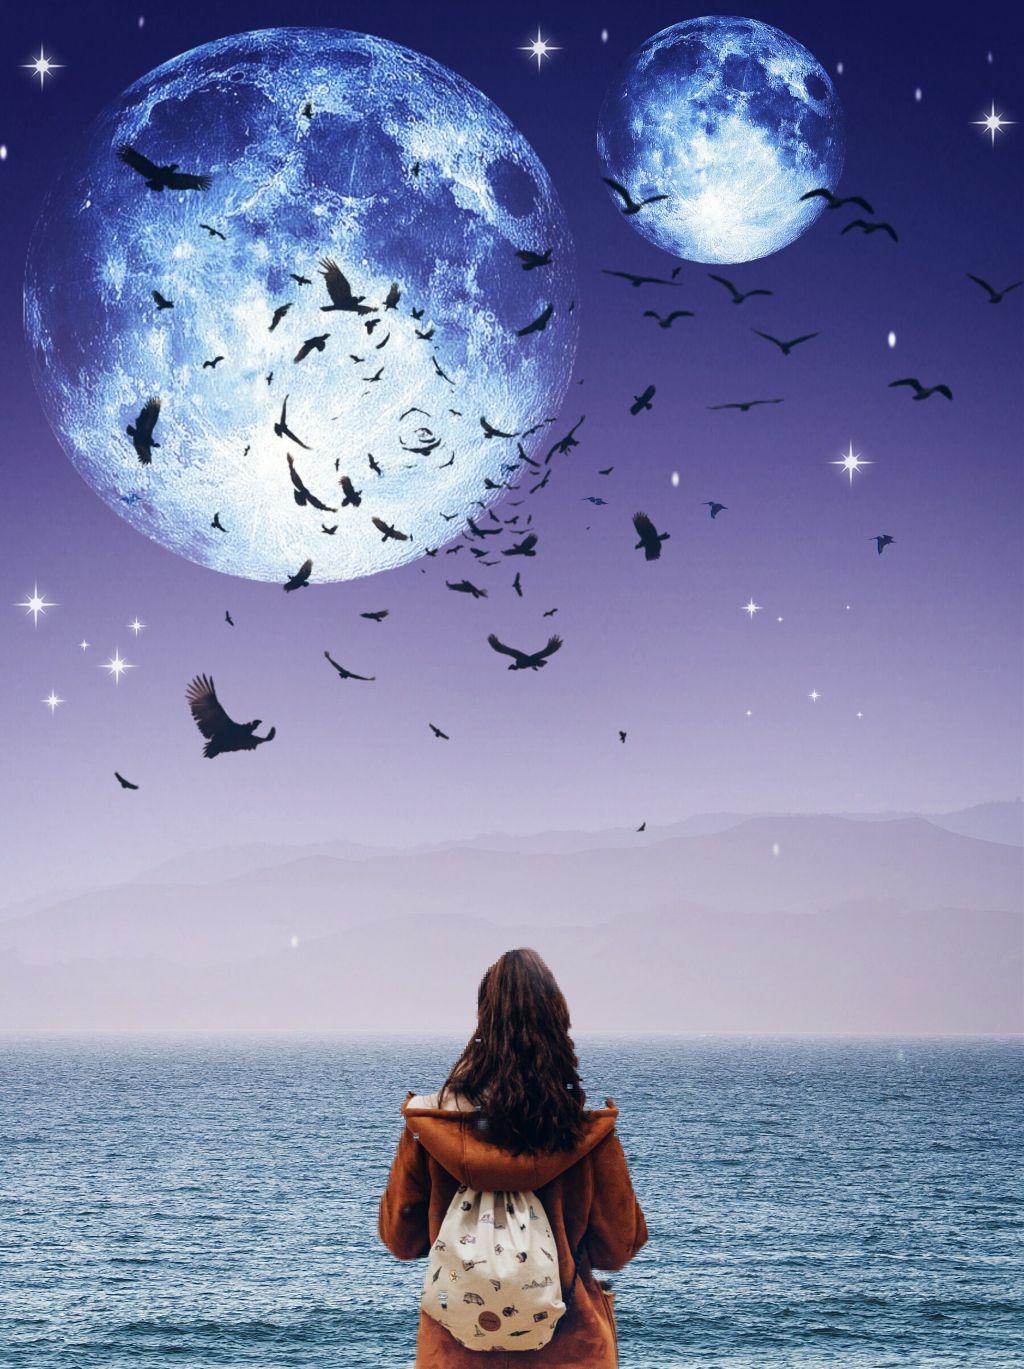 #freetoedit #myedit #moon #girl #remixit #madebyme #madewithpicsart #picsartmylife #freedom #dreams